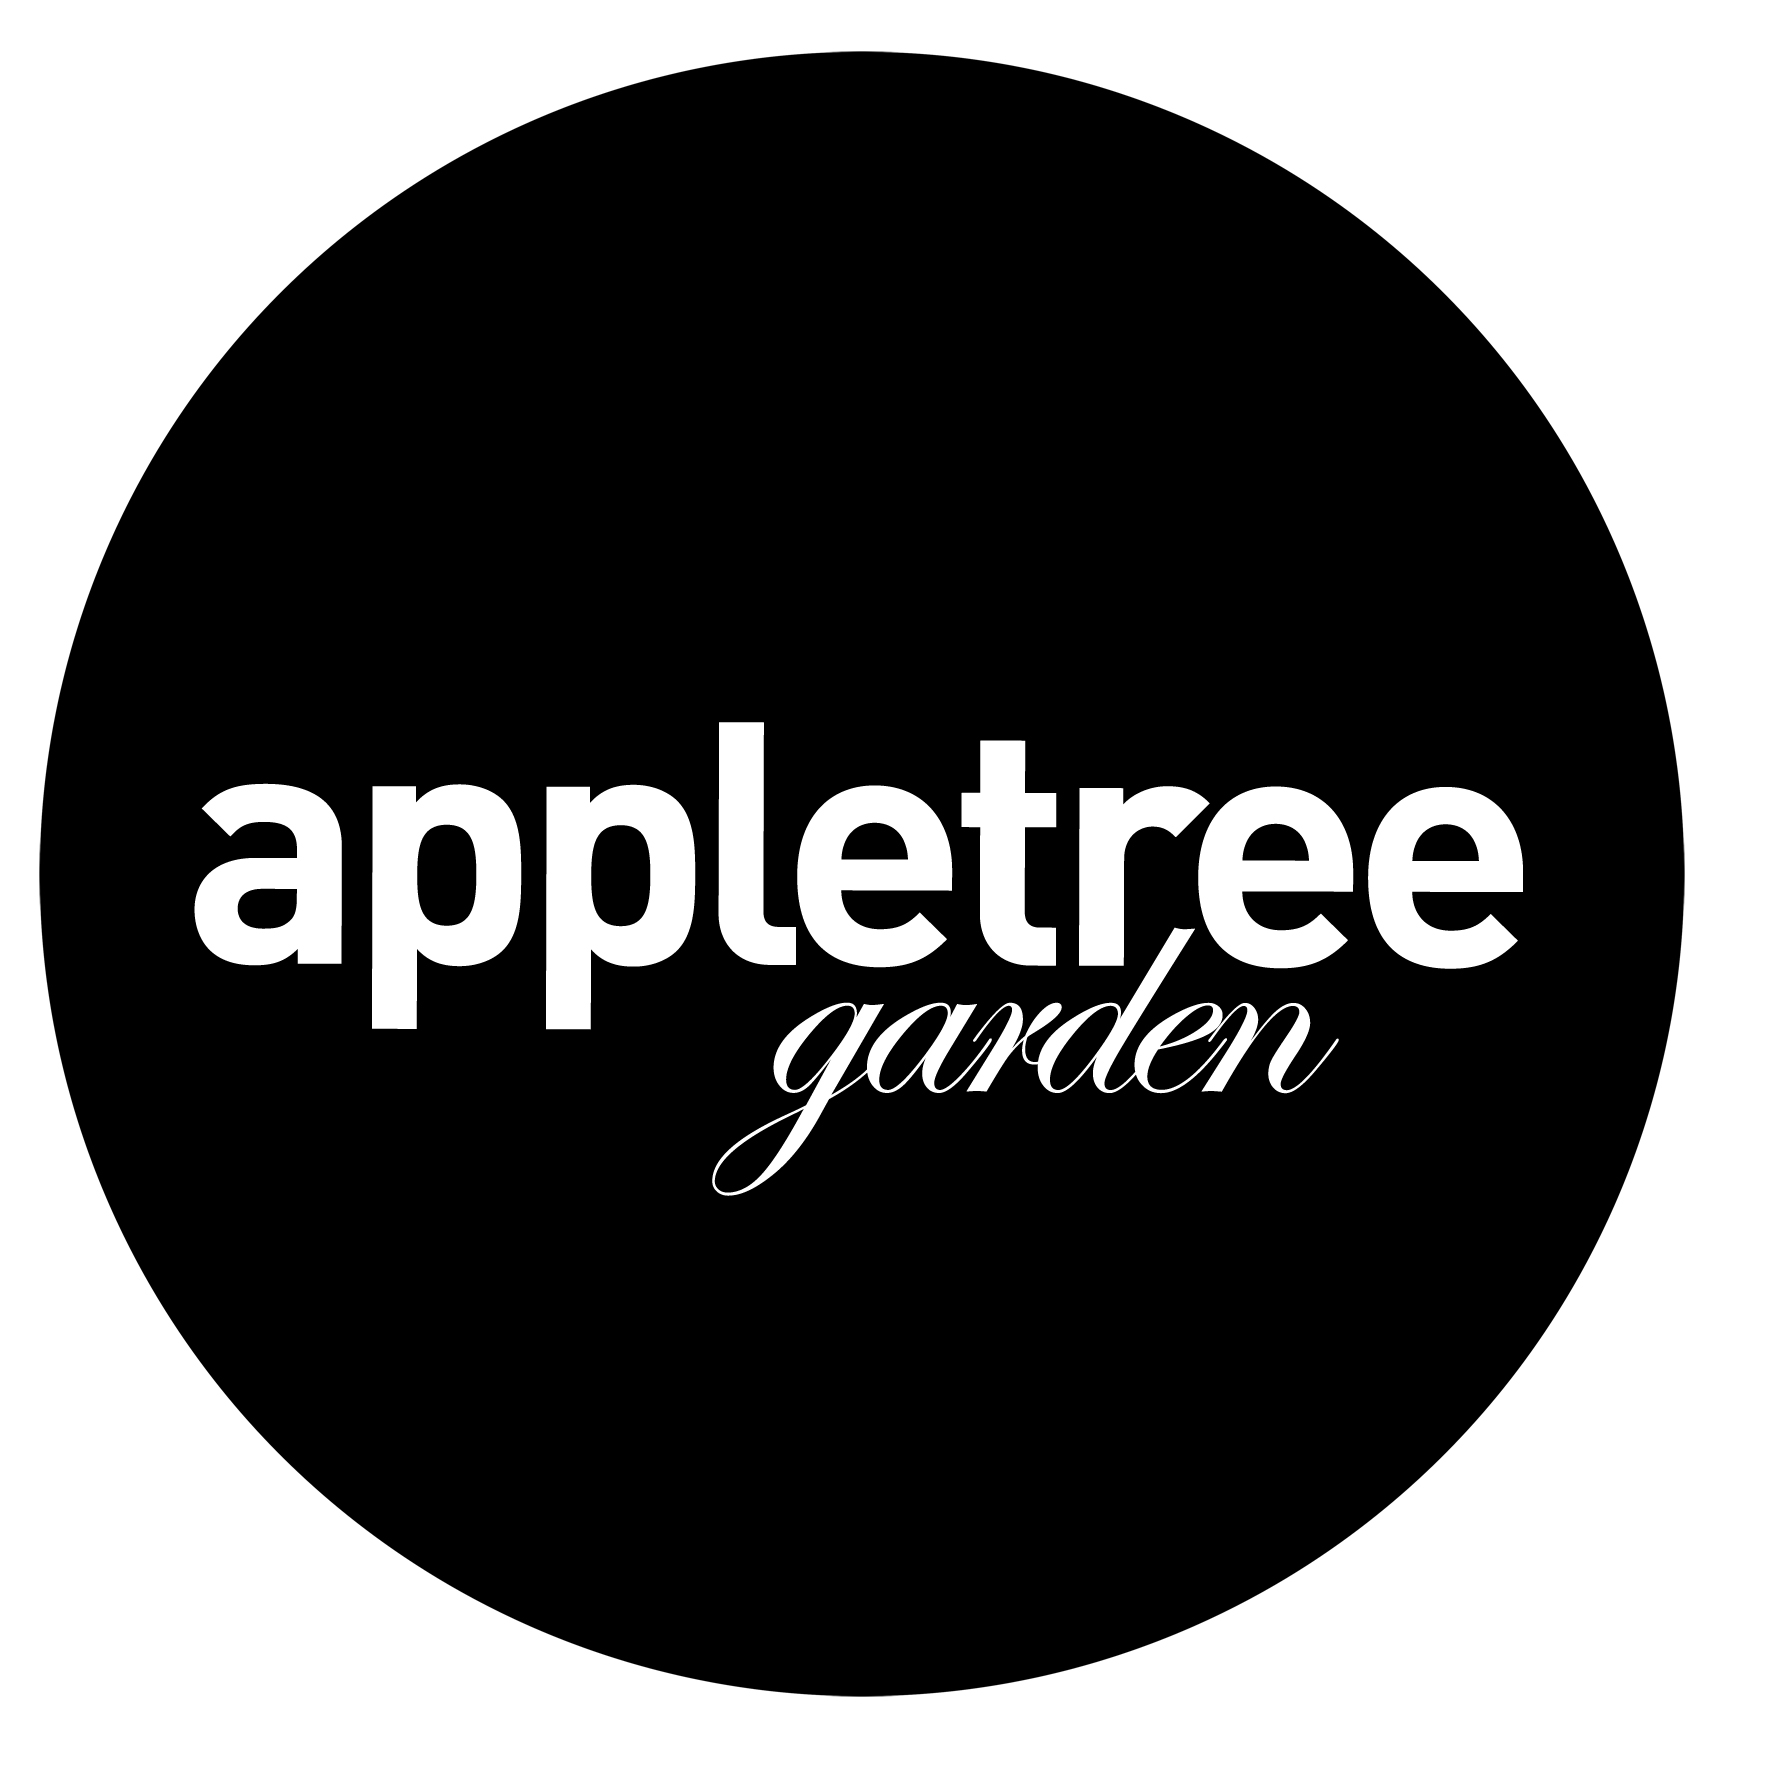 Appletree Festival